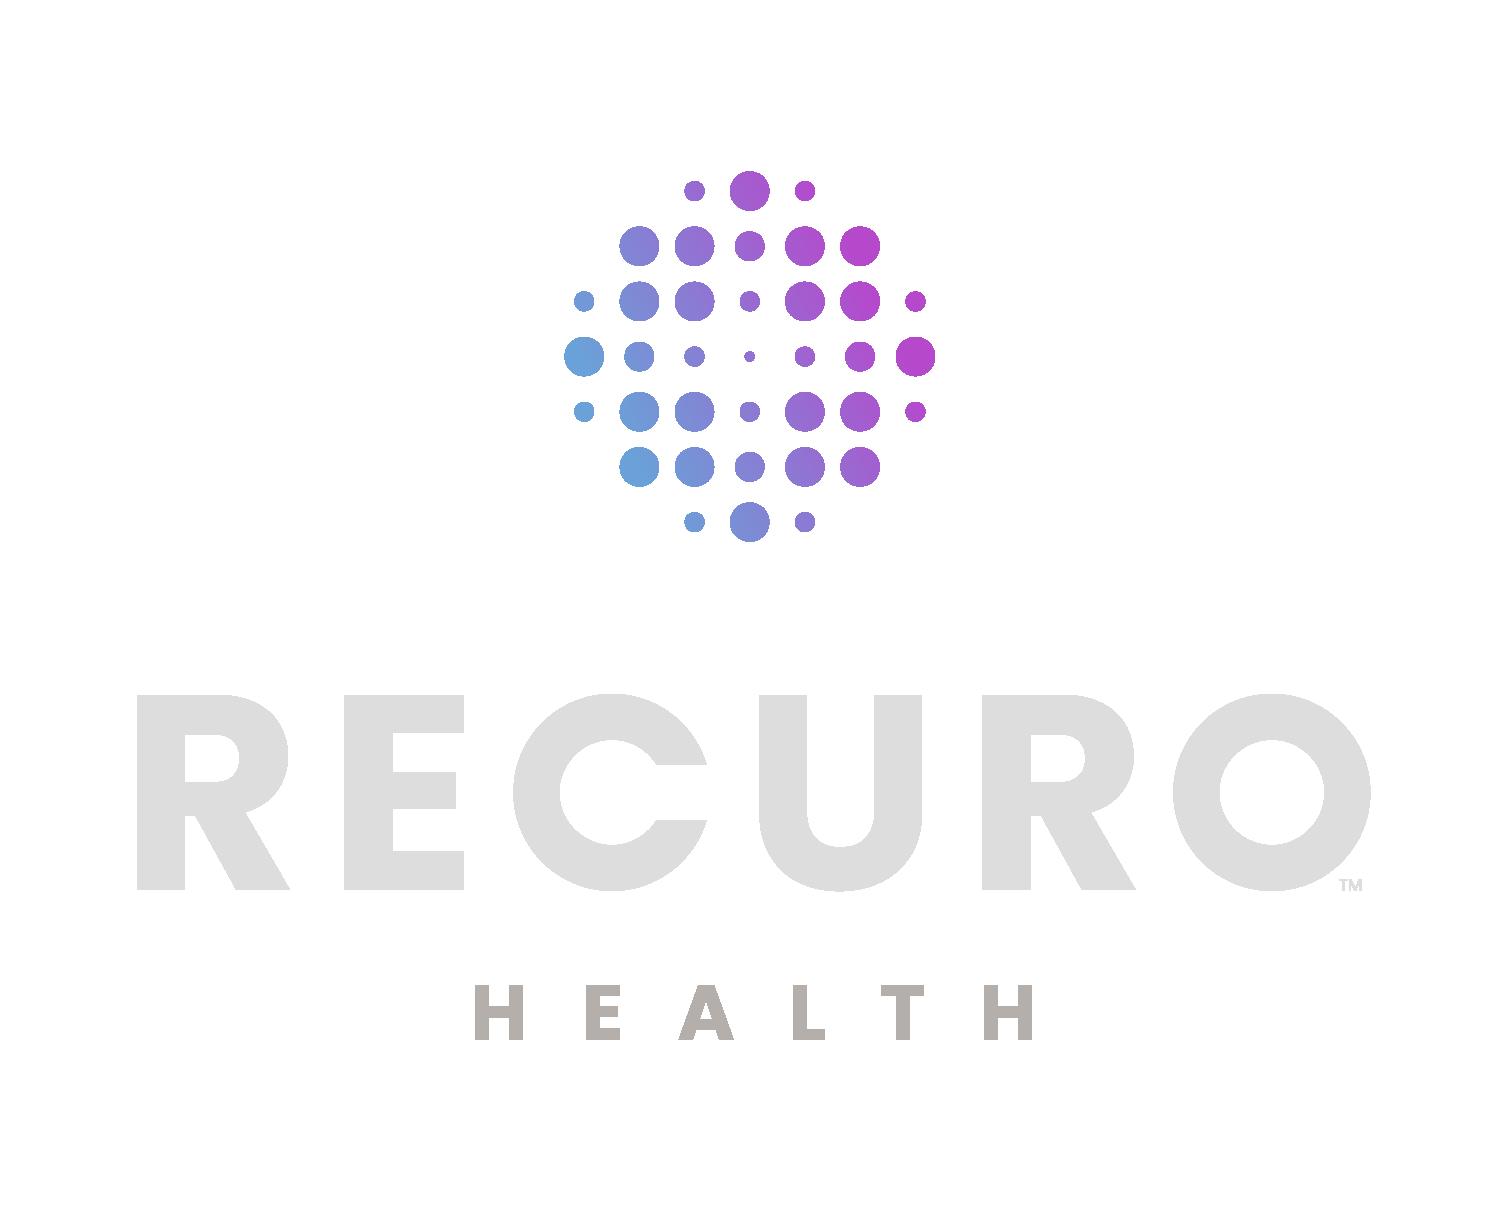 RecuroHealth-logo-footer@4x